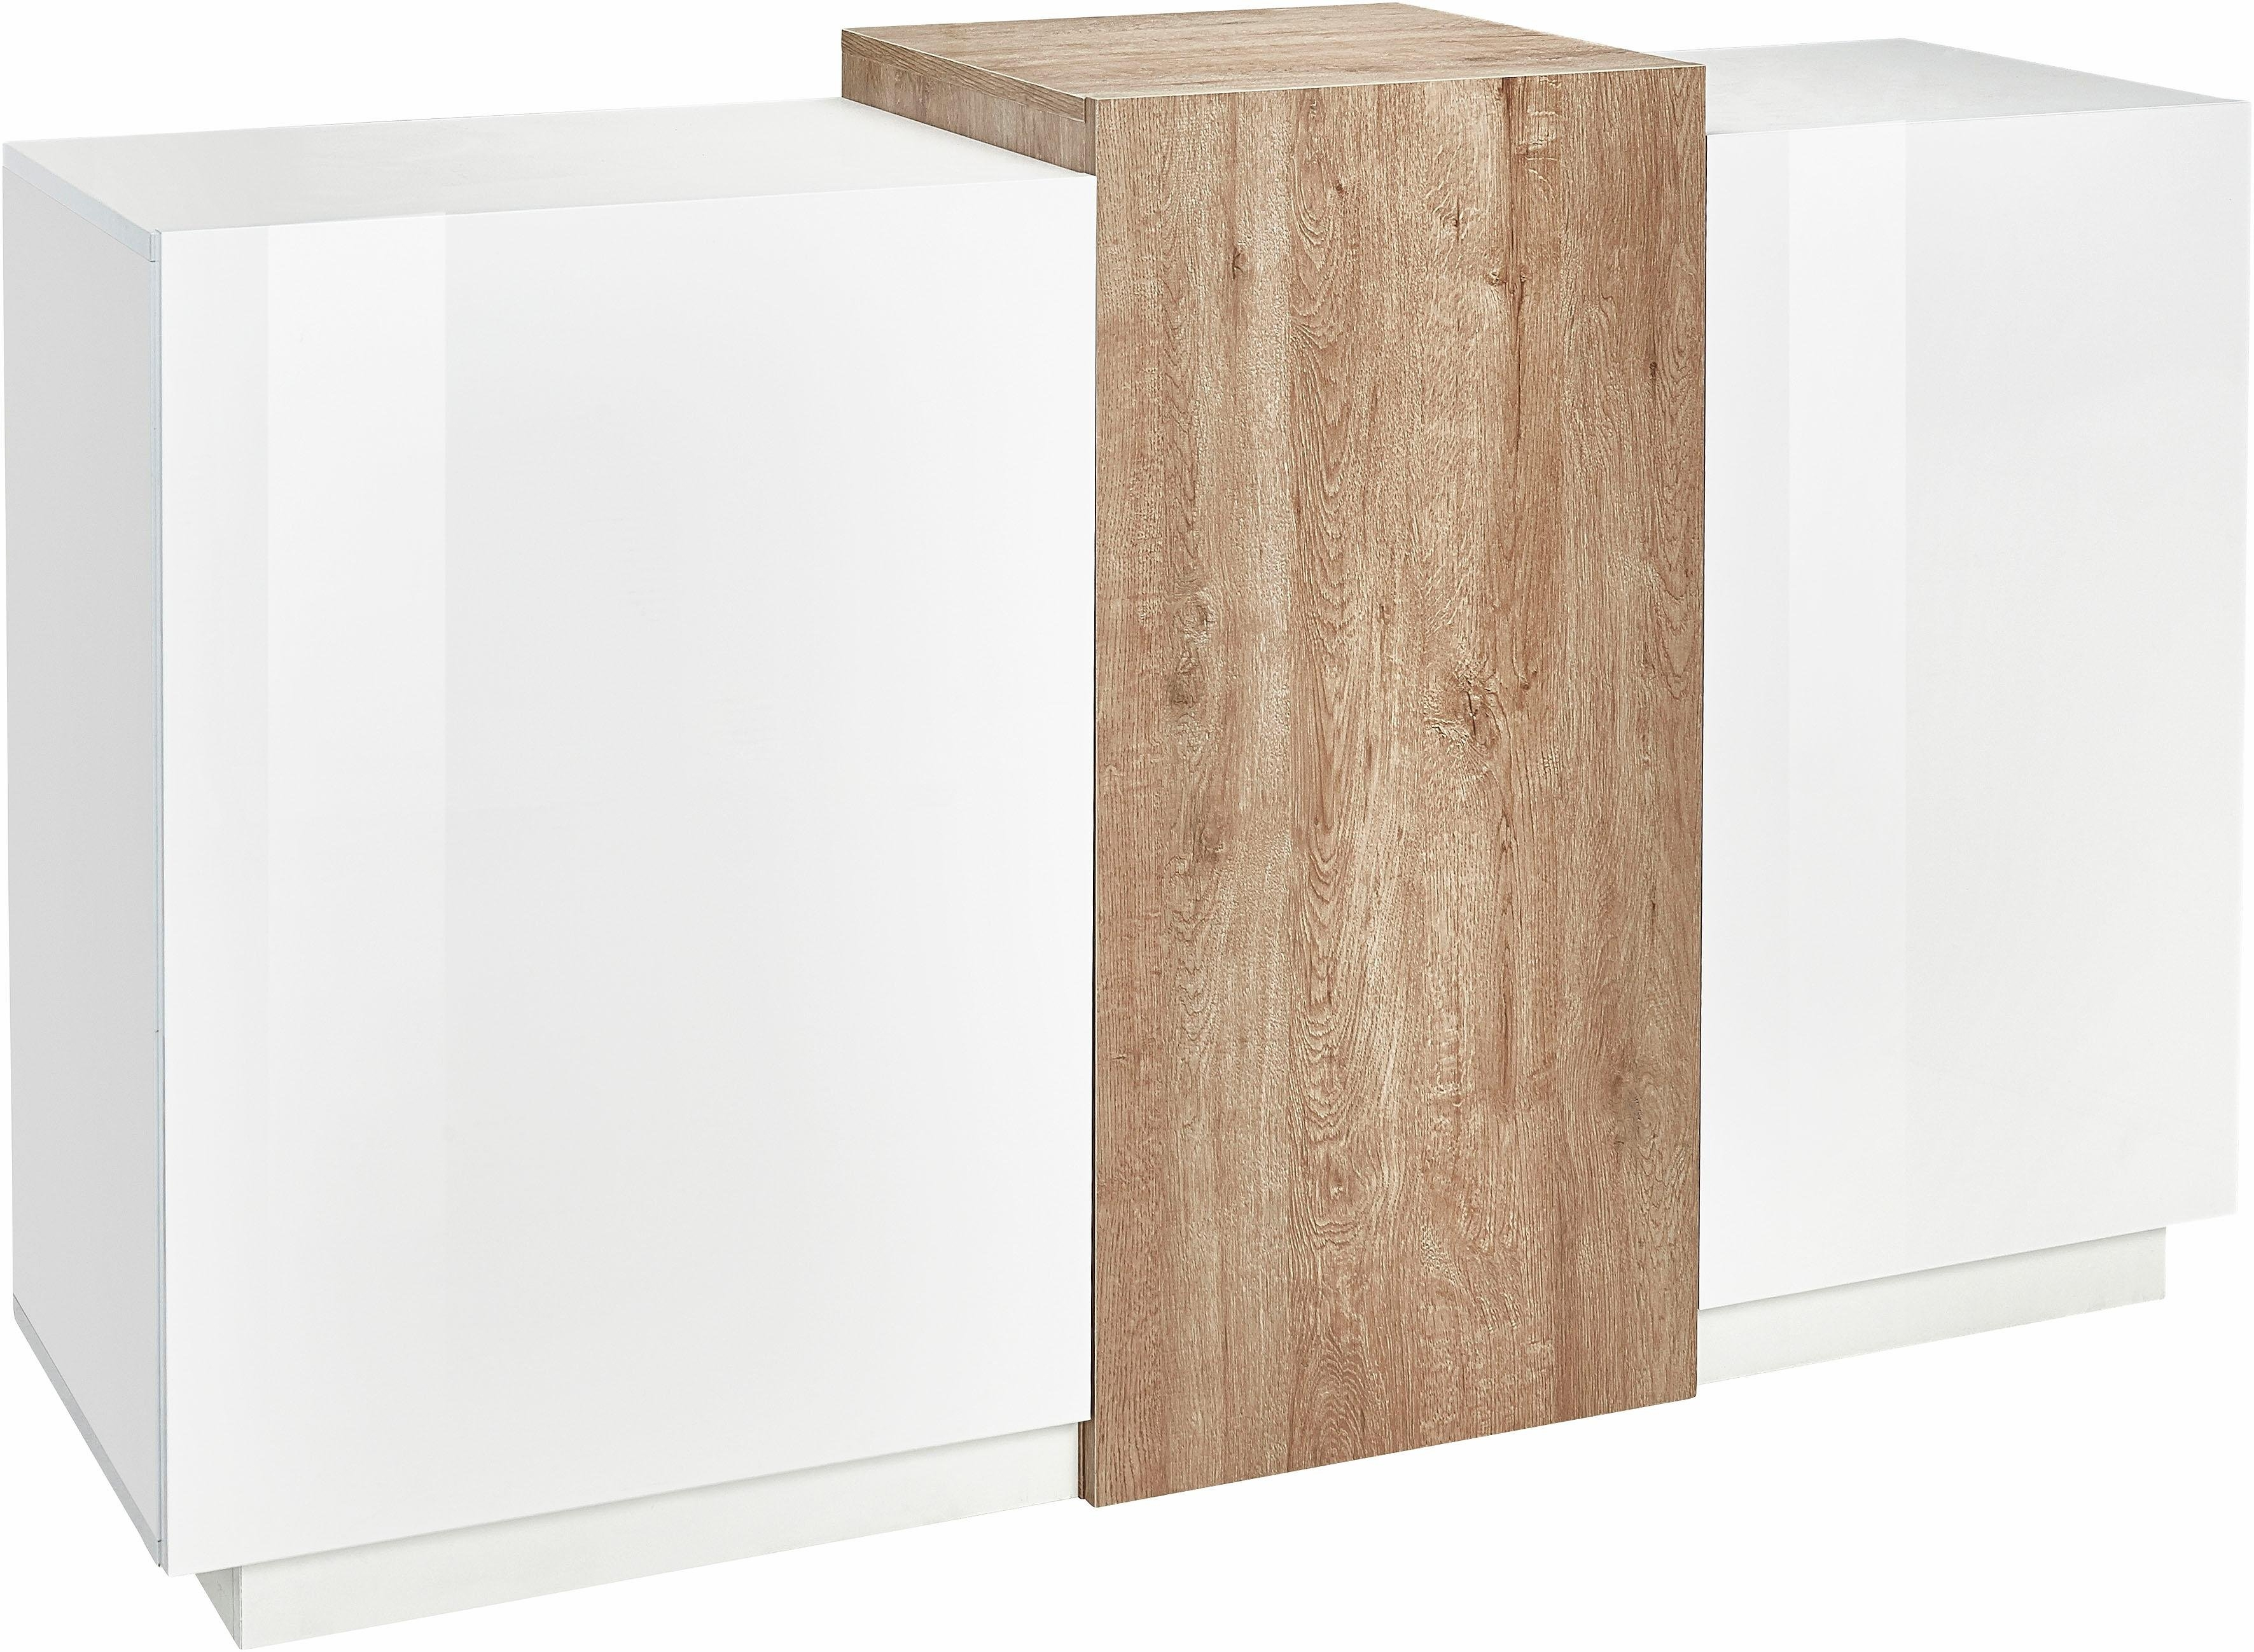 tecnos sideboard breedte 150 cm makkelijk besteld otto. Black Bedroom Furniture Sets. Home Design Ideas